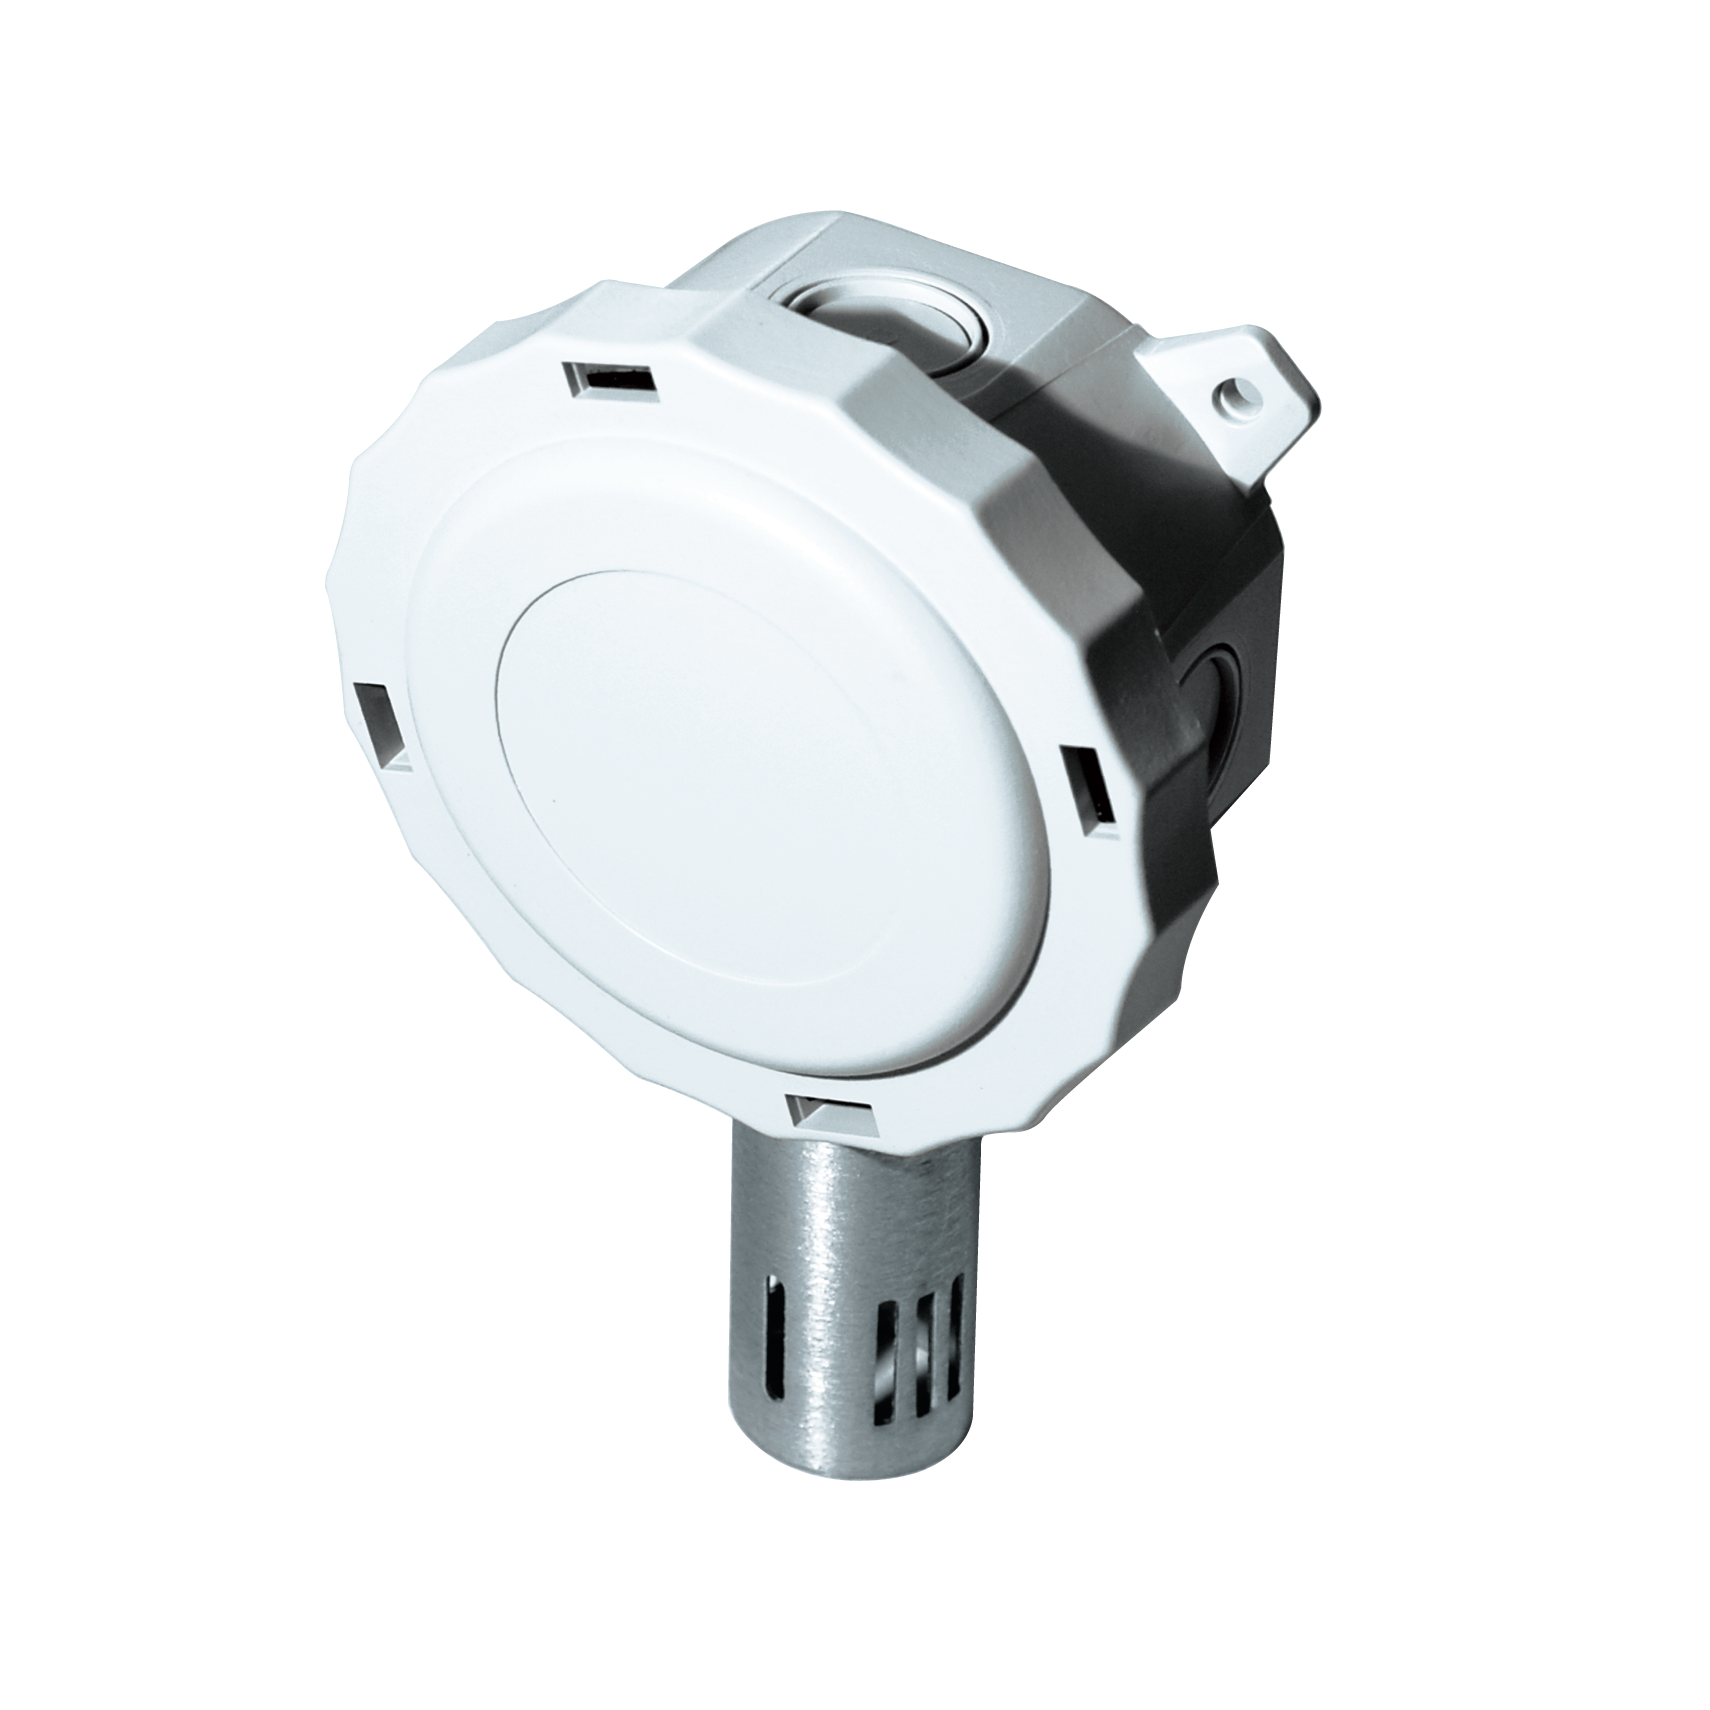 ACI A/RH3-O-5 Humidity Transmitter